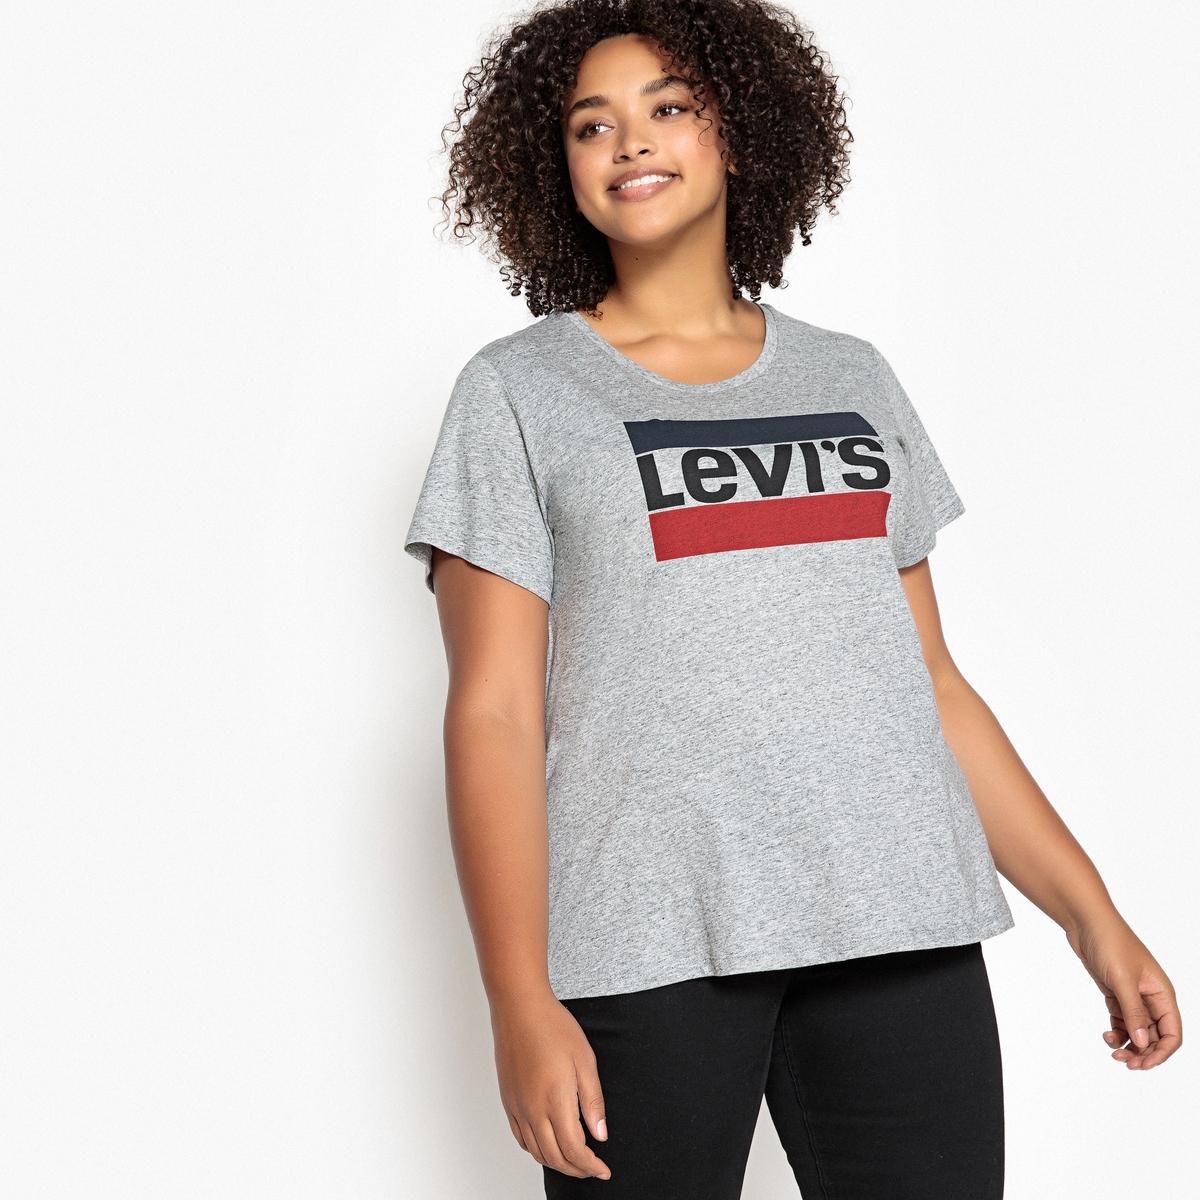 LEVI'S PLUS - Camiseta lisa con cuello redondo, manga corta